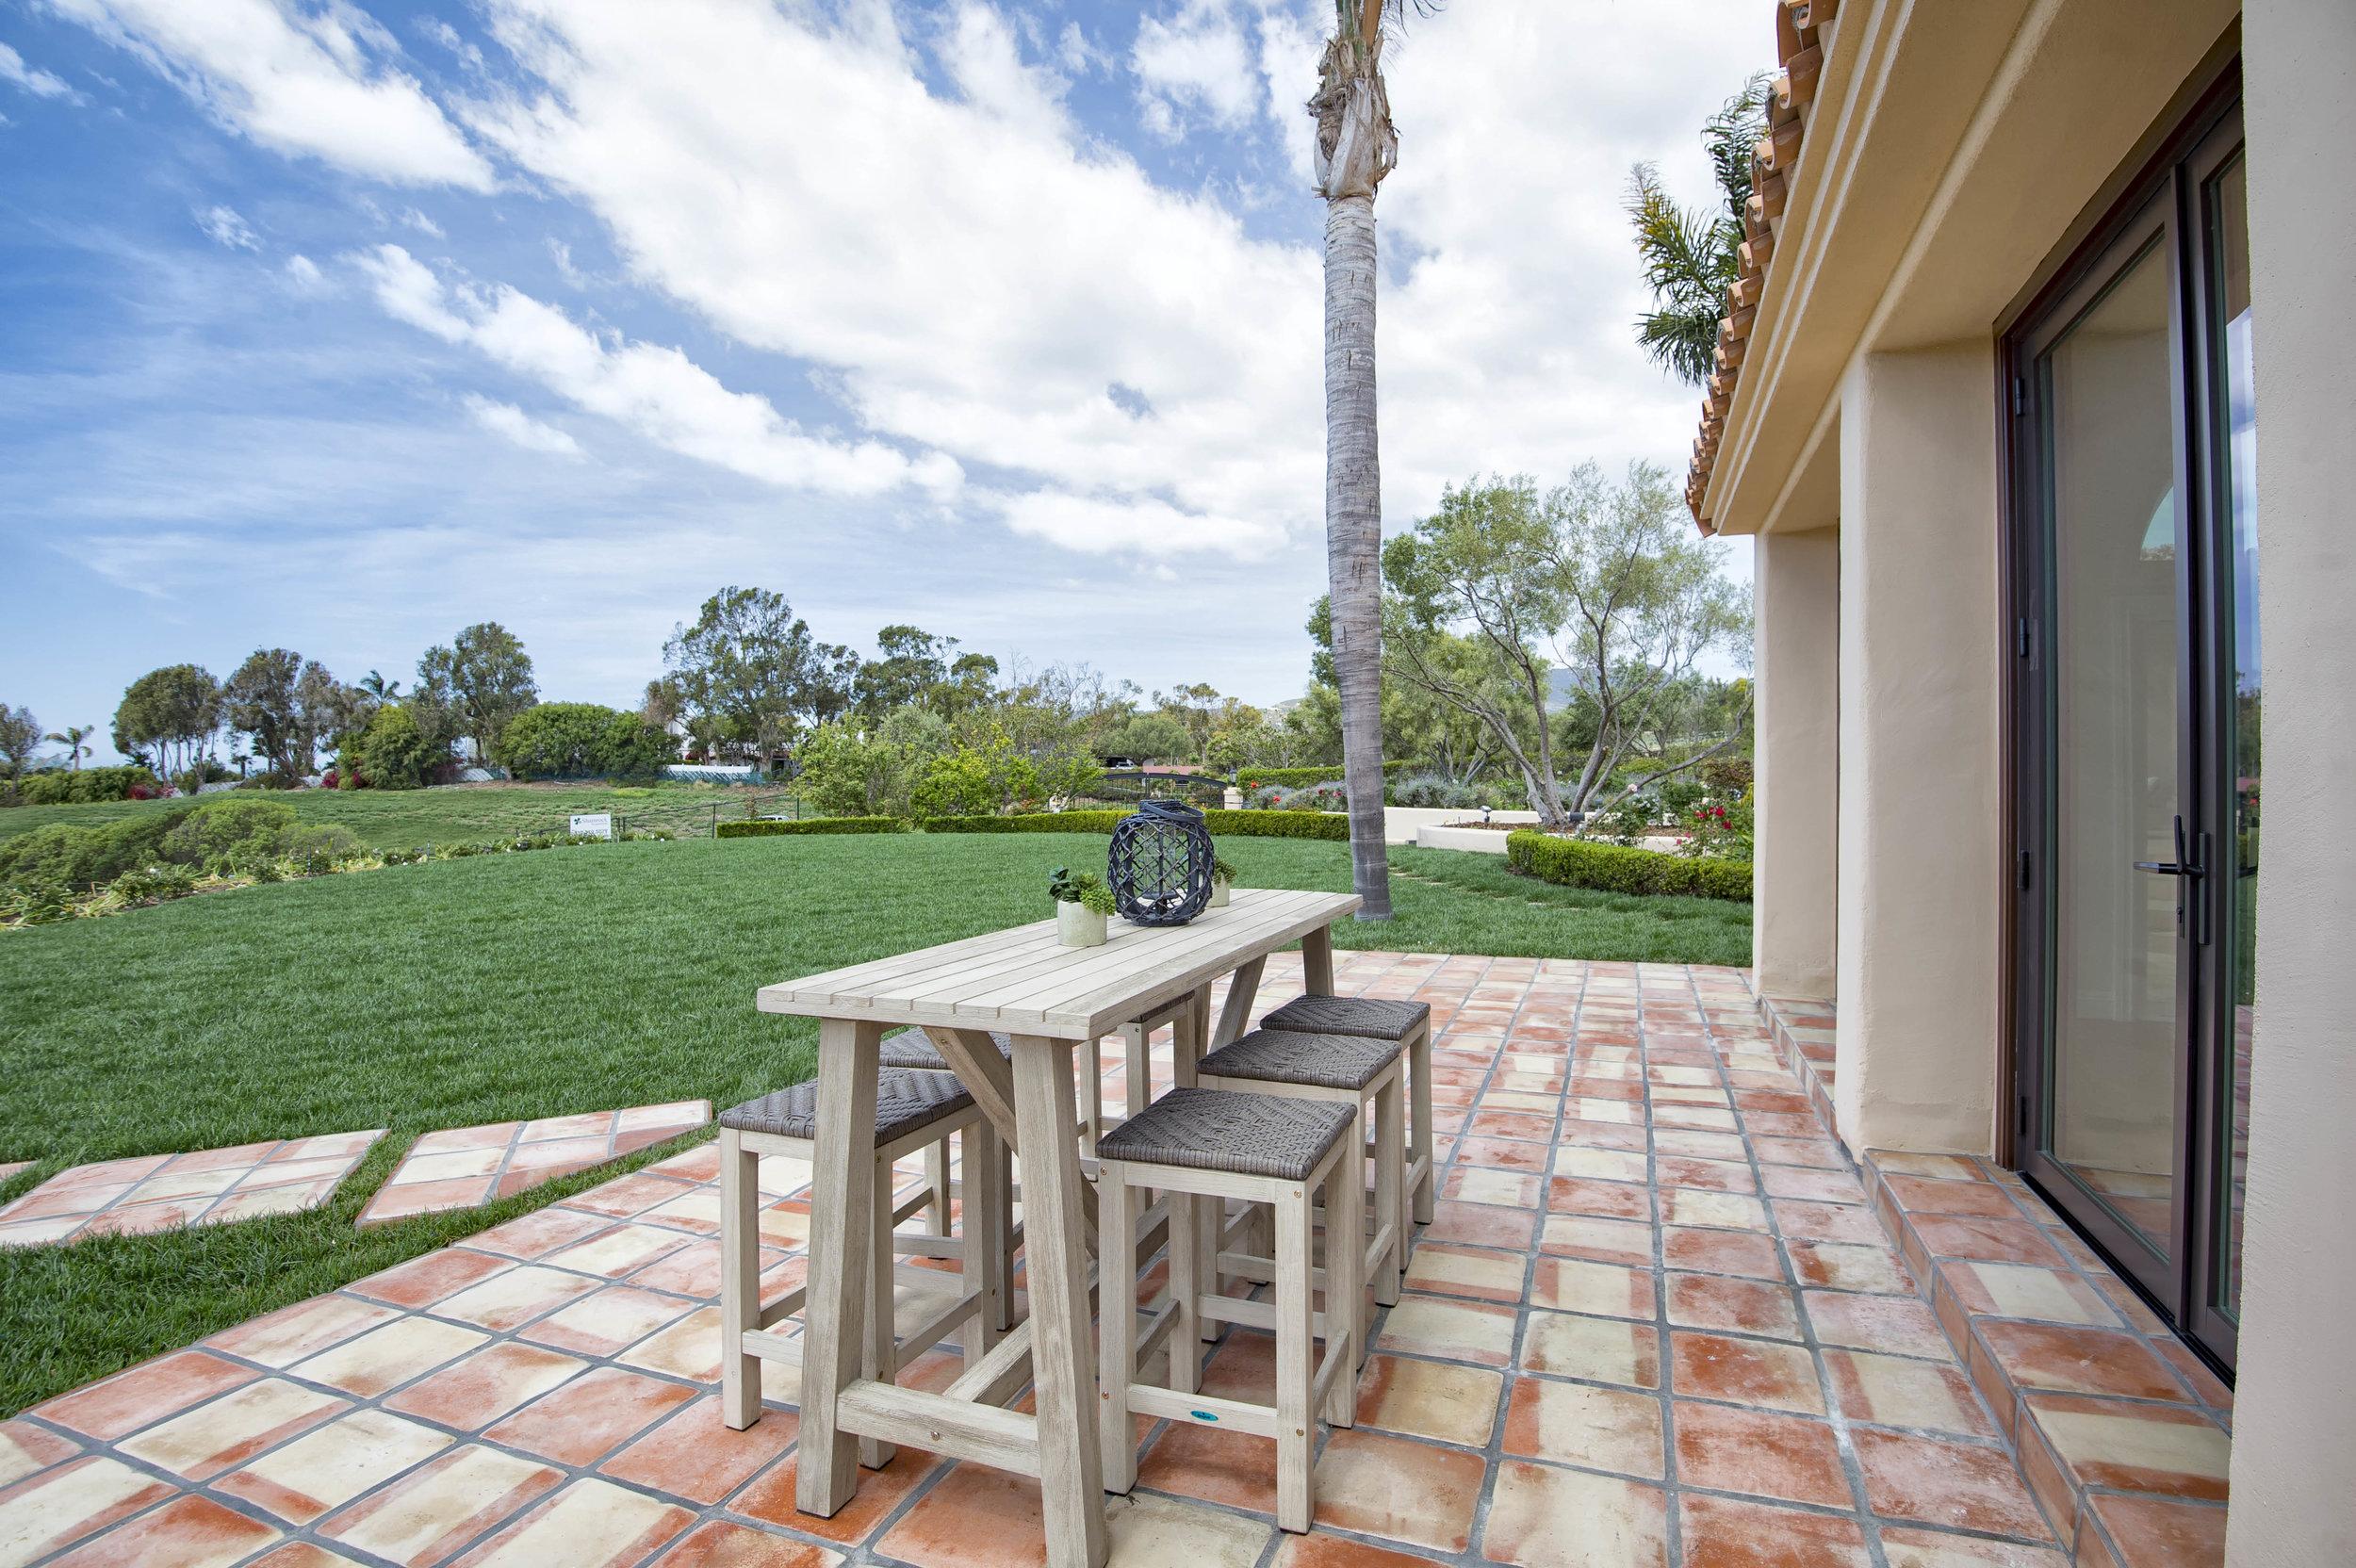 015 Yard 6130 Via Cabrillo For Sale Lease The Malibu Life Team Luxury Real Estate.jpg